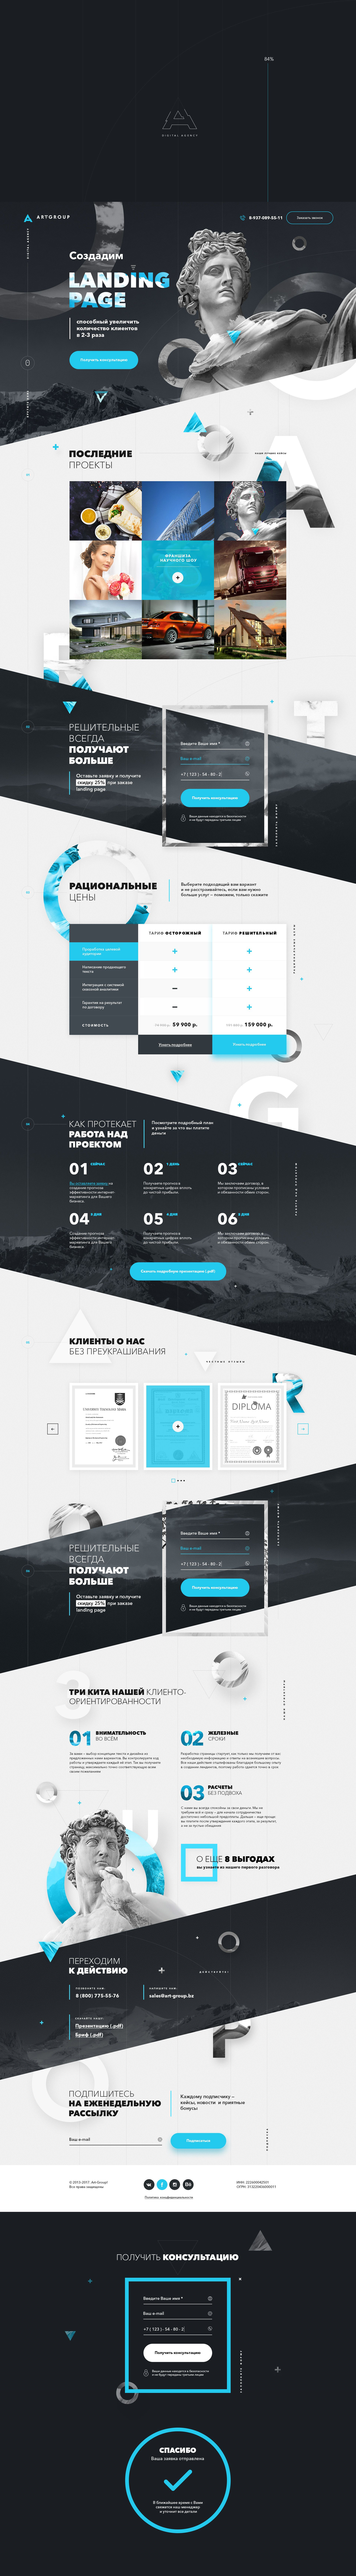 Digital Agency Art Group Web Design 2018 Web Trends Minimalist Web Design Web Design Tips Web Trends